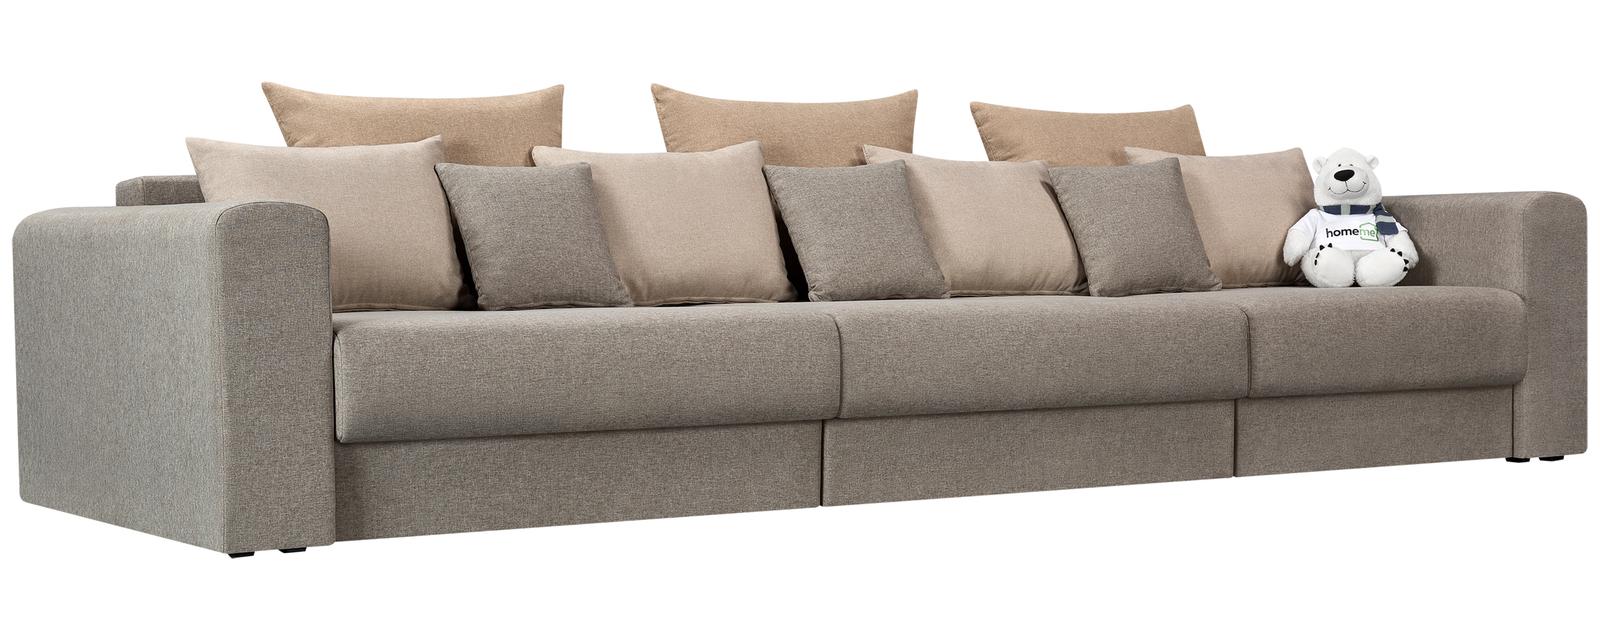 Модульный диван Медисон Вариант №1 Kiton серый (Рогожка)